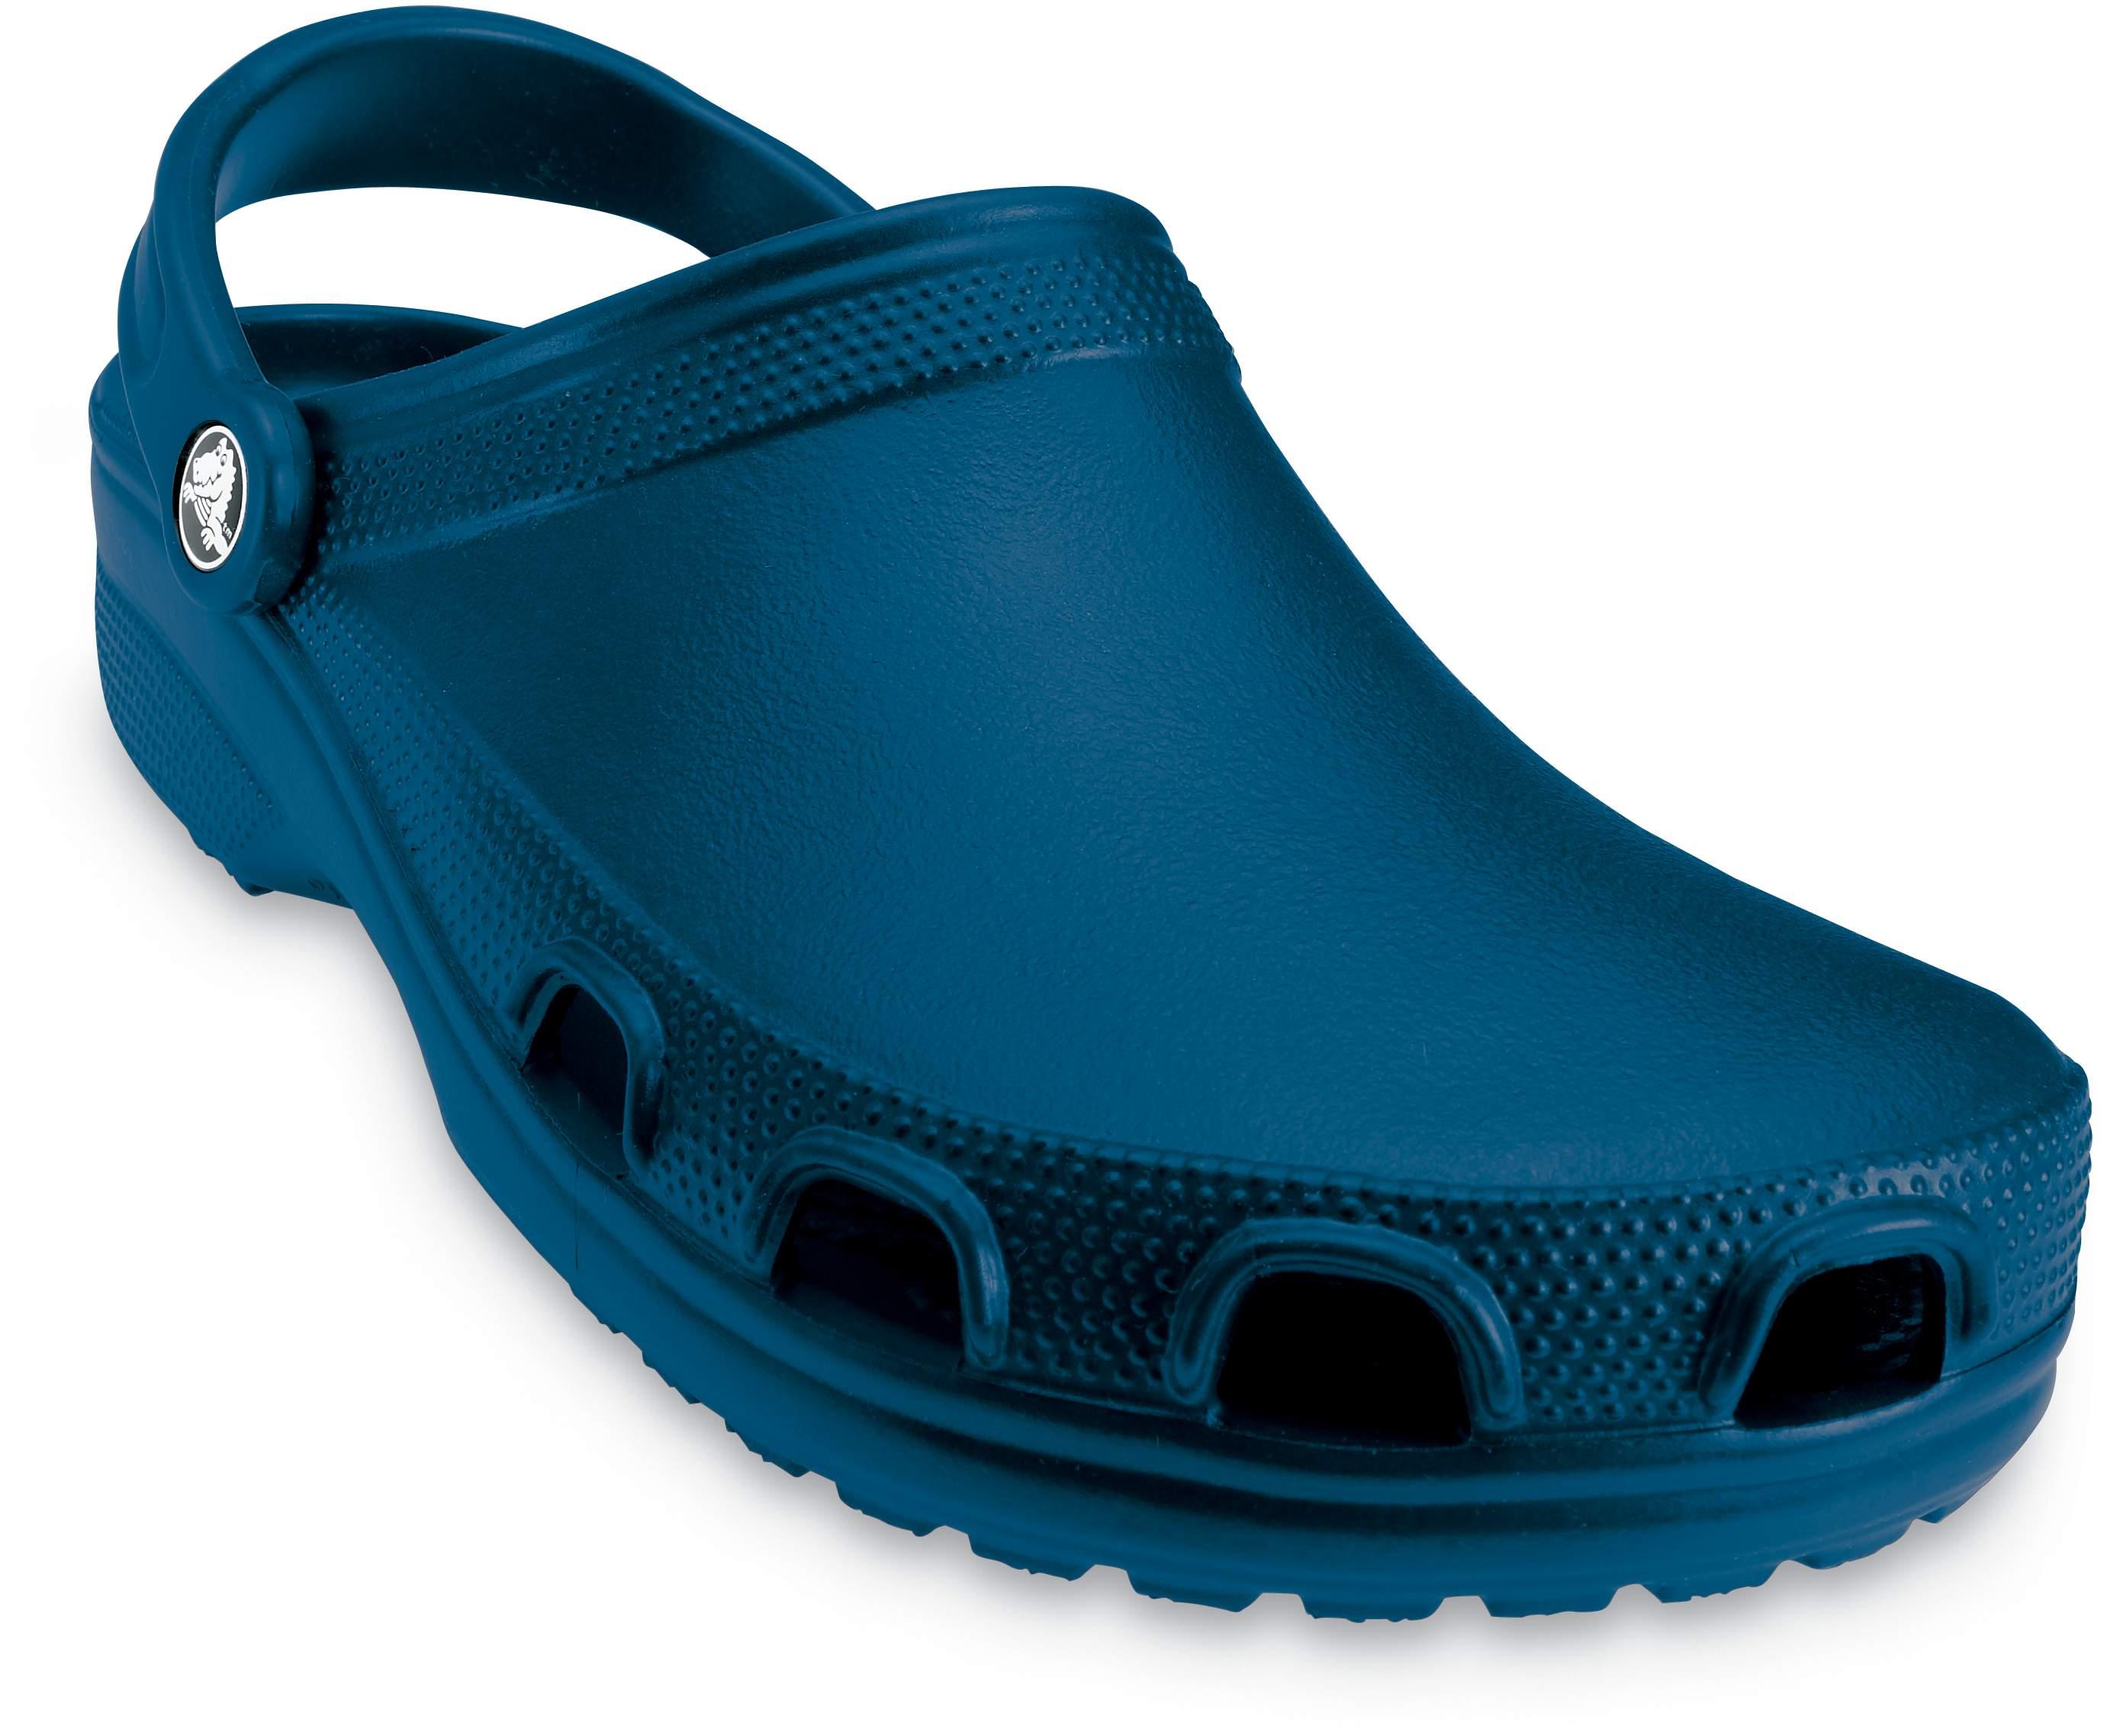 Crocs Rx Relief Unisex Clog